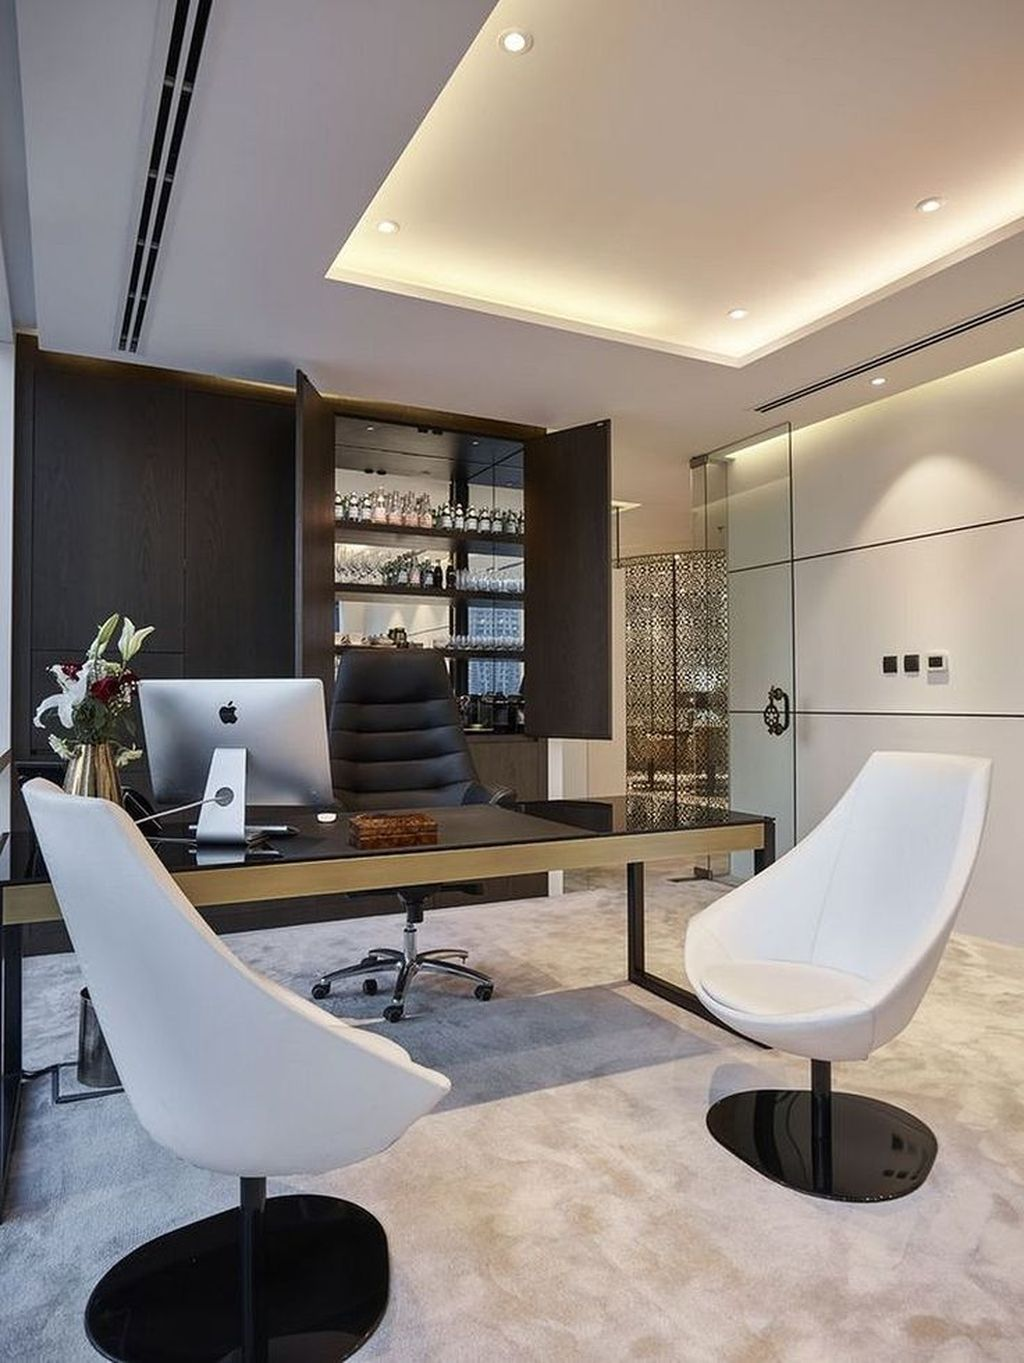 Gorgeous Modern Office Interior Design Ideas You Never Seen Before 12